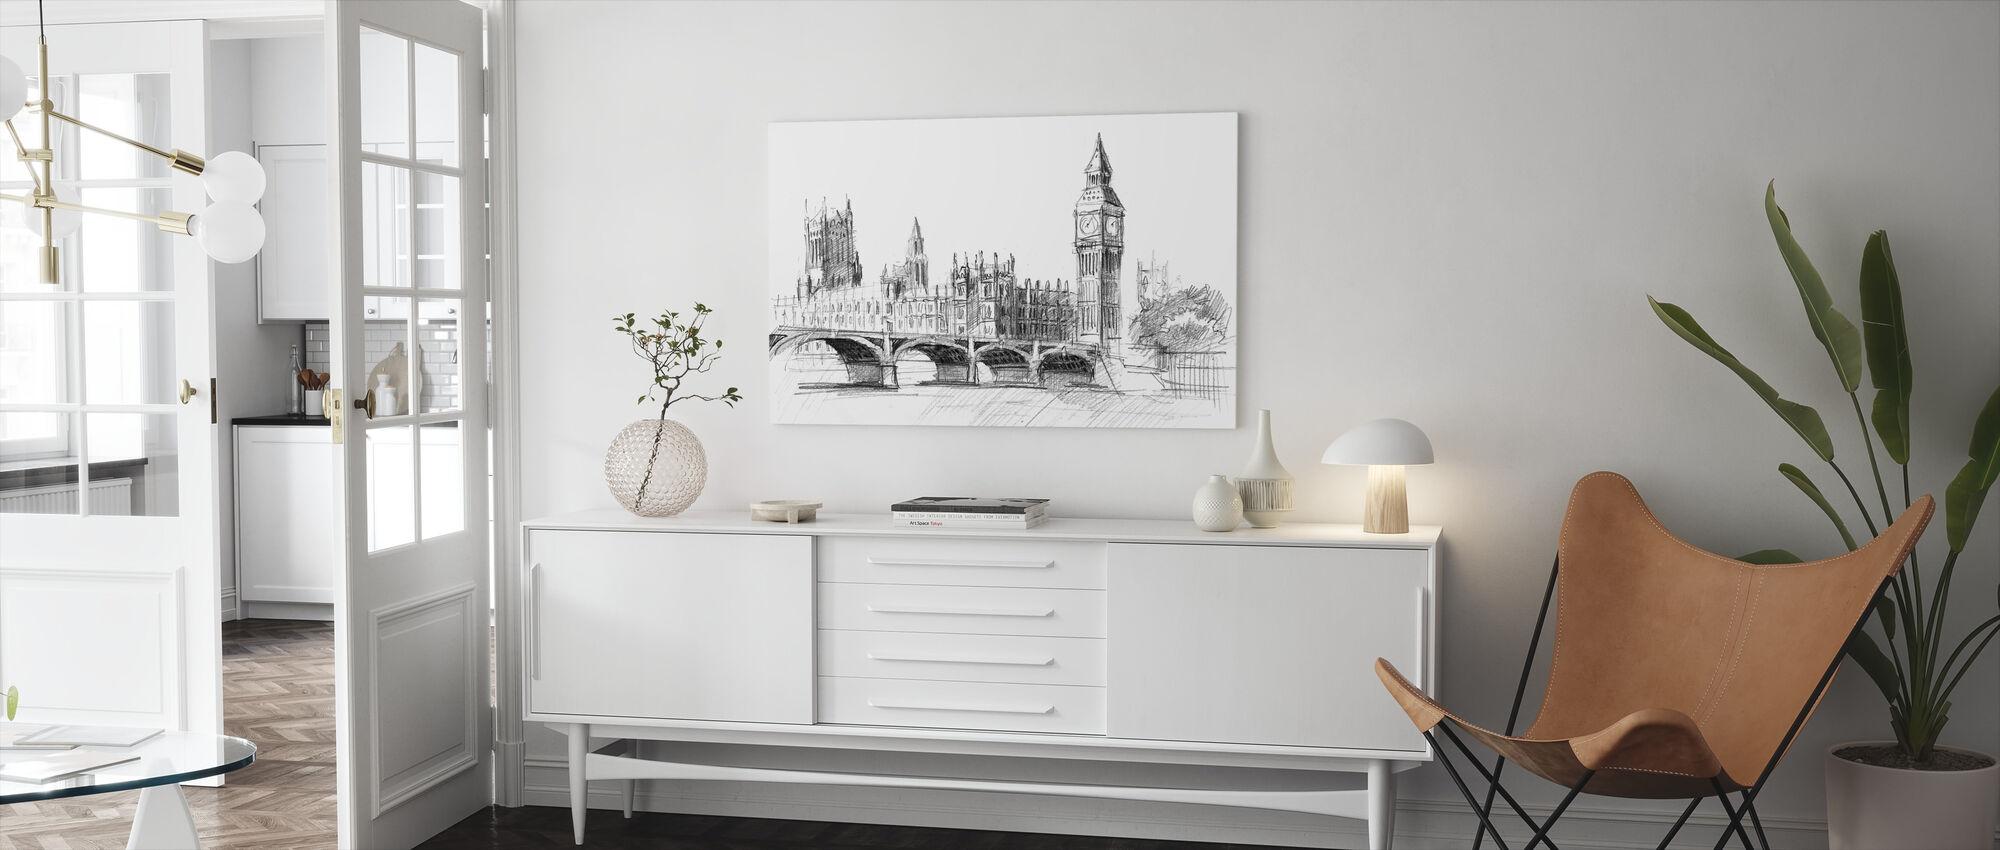 Big Ben i svart bly - Lerretsbilde - Stue